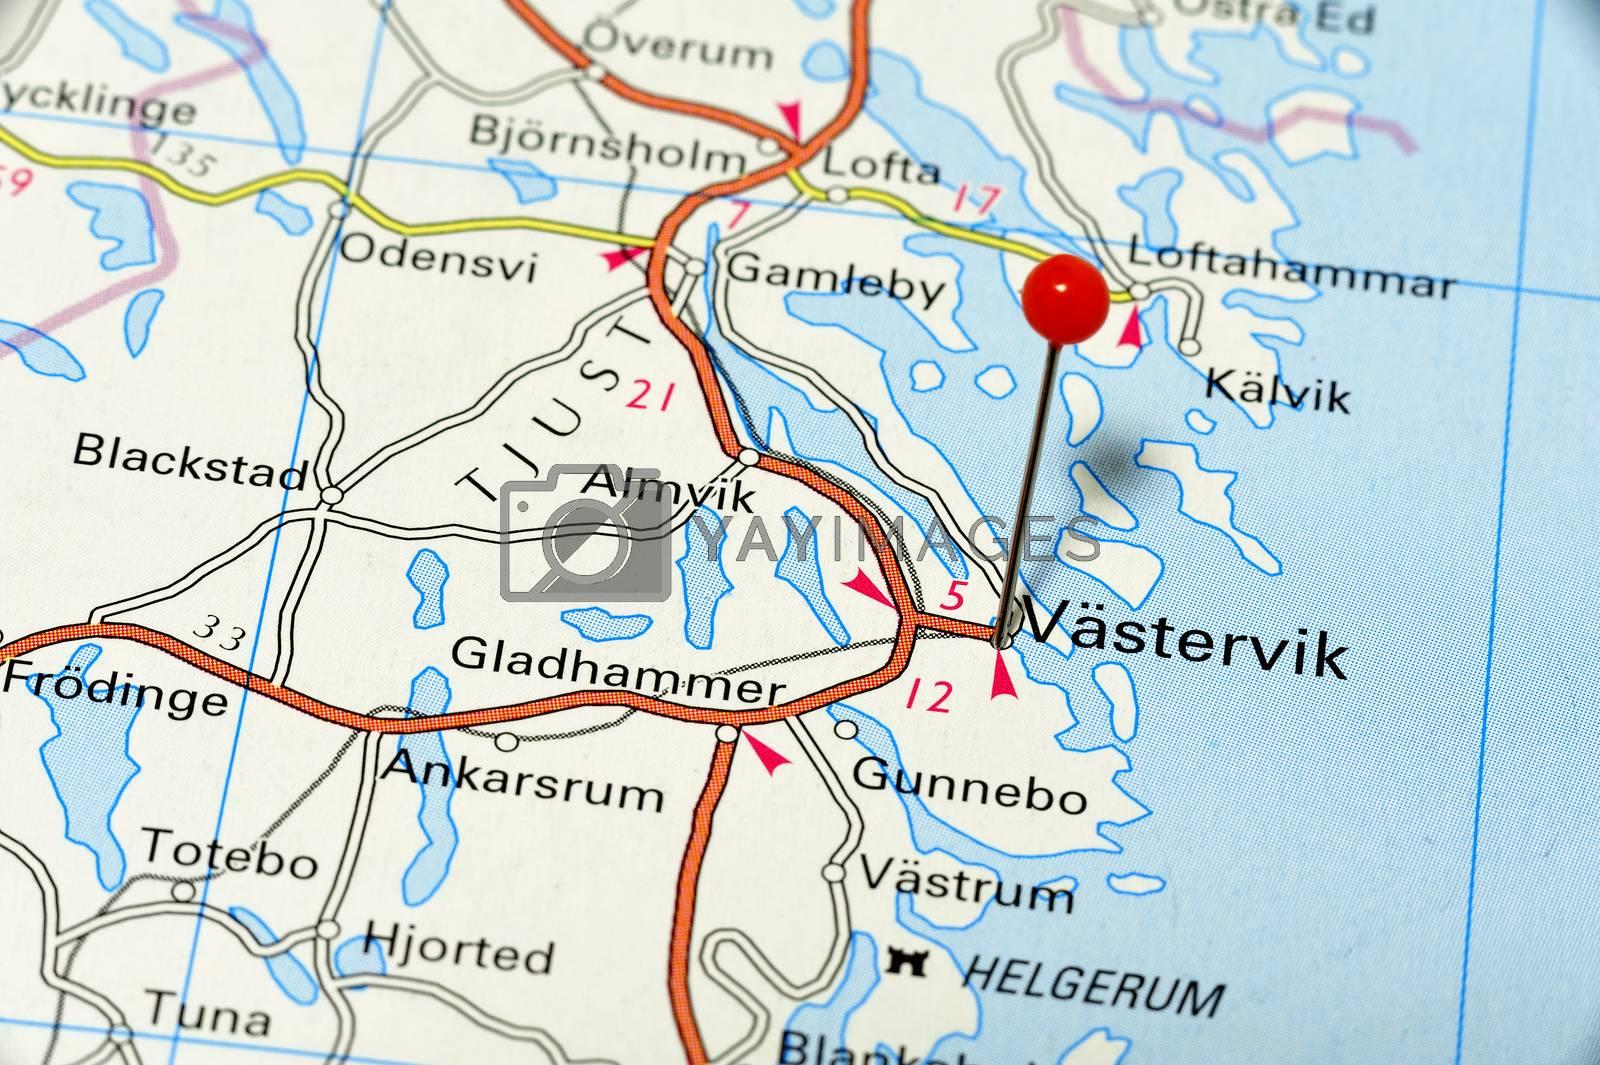 Closeup map of Västervik. Västervik a city in Sweden.